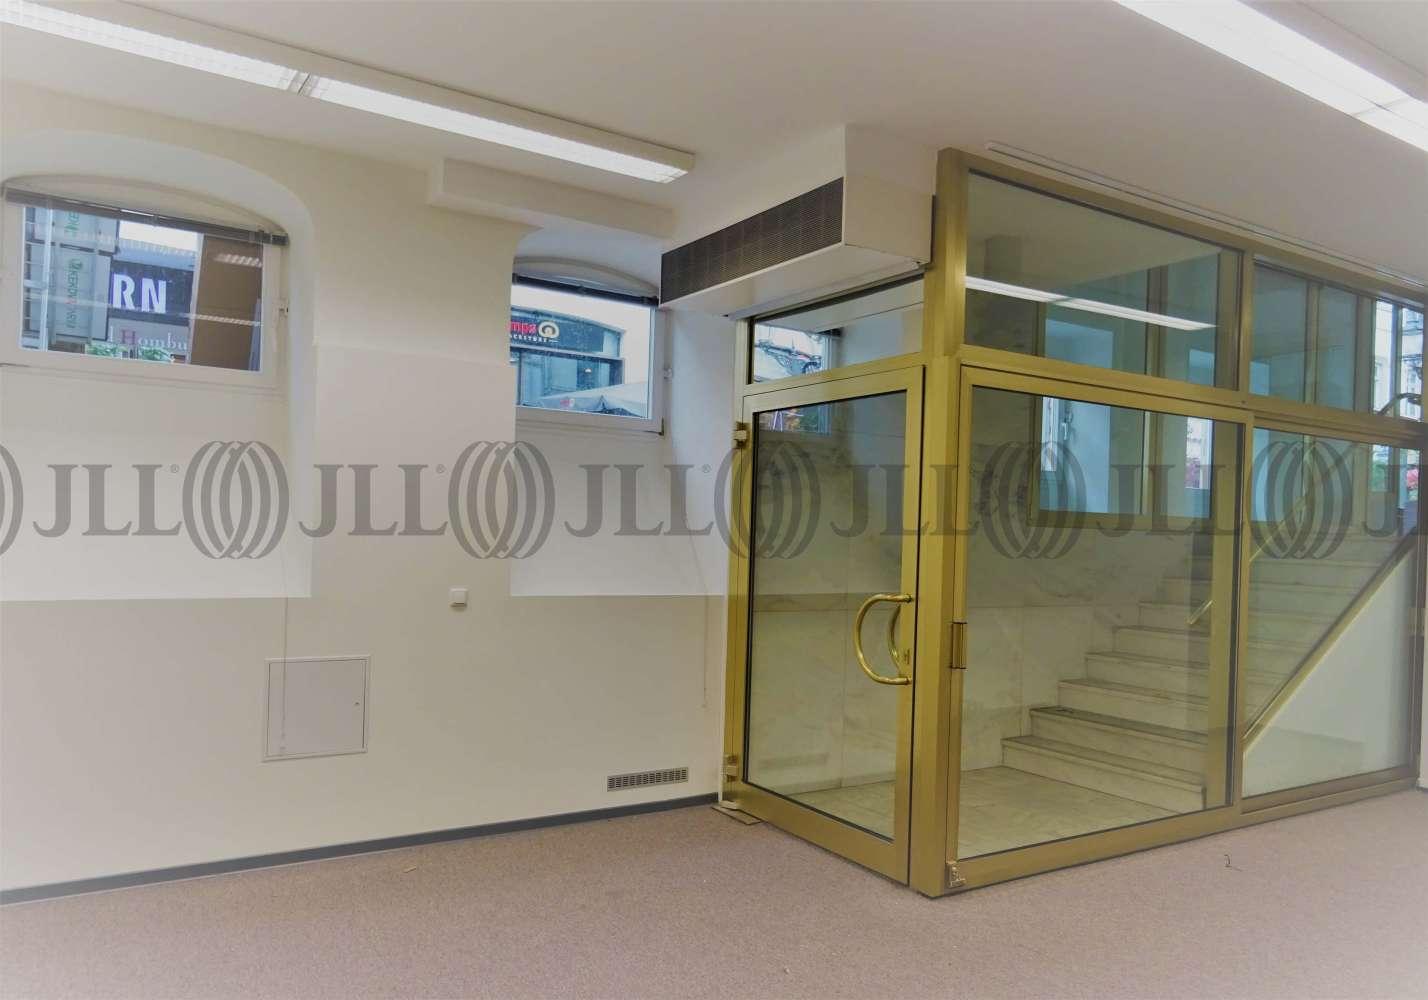 Büros Bad homburg, 61348 - Büro - Bad Homburg - F2638 - 10318943